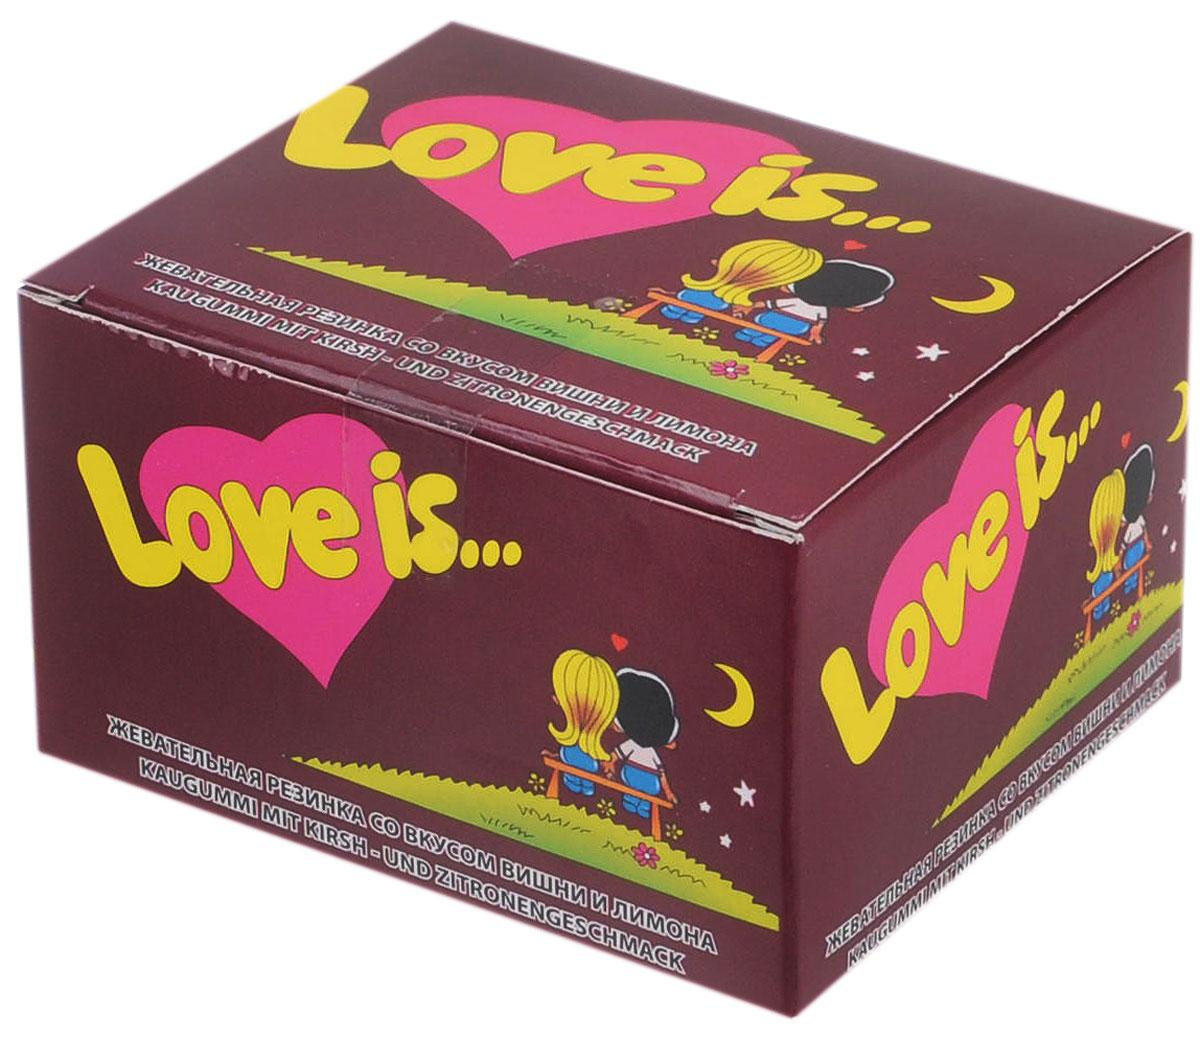 Love is Жевательная резинка, вишня-лимон, 20 шт ( 4640000277901 )